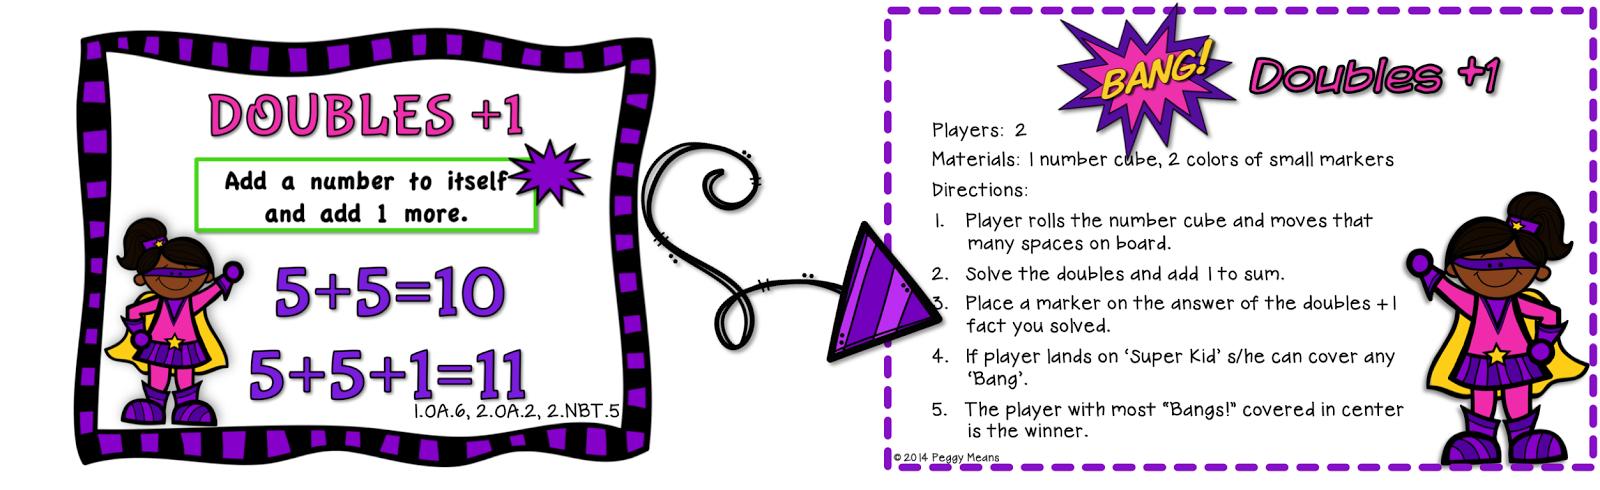 3 Tips to Build Math Fact Fluency - Primary Flourish